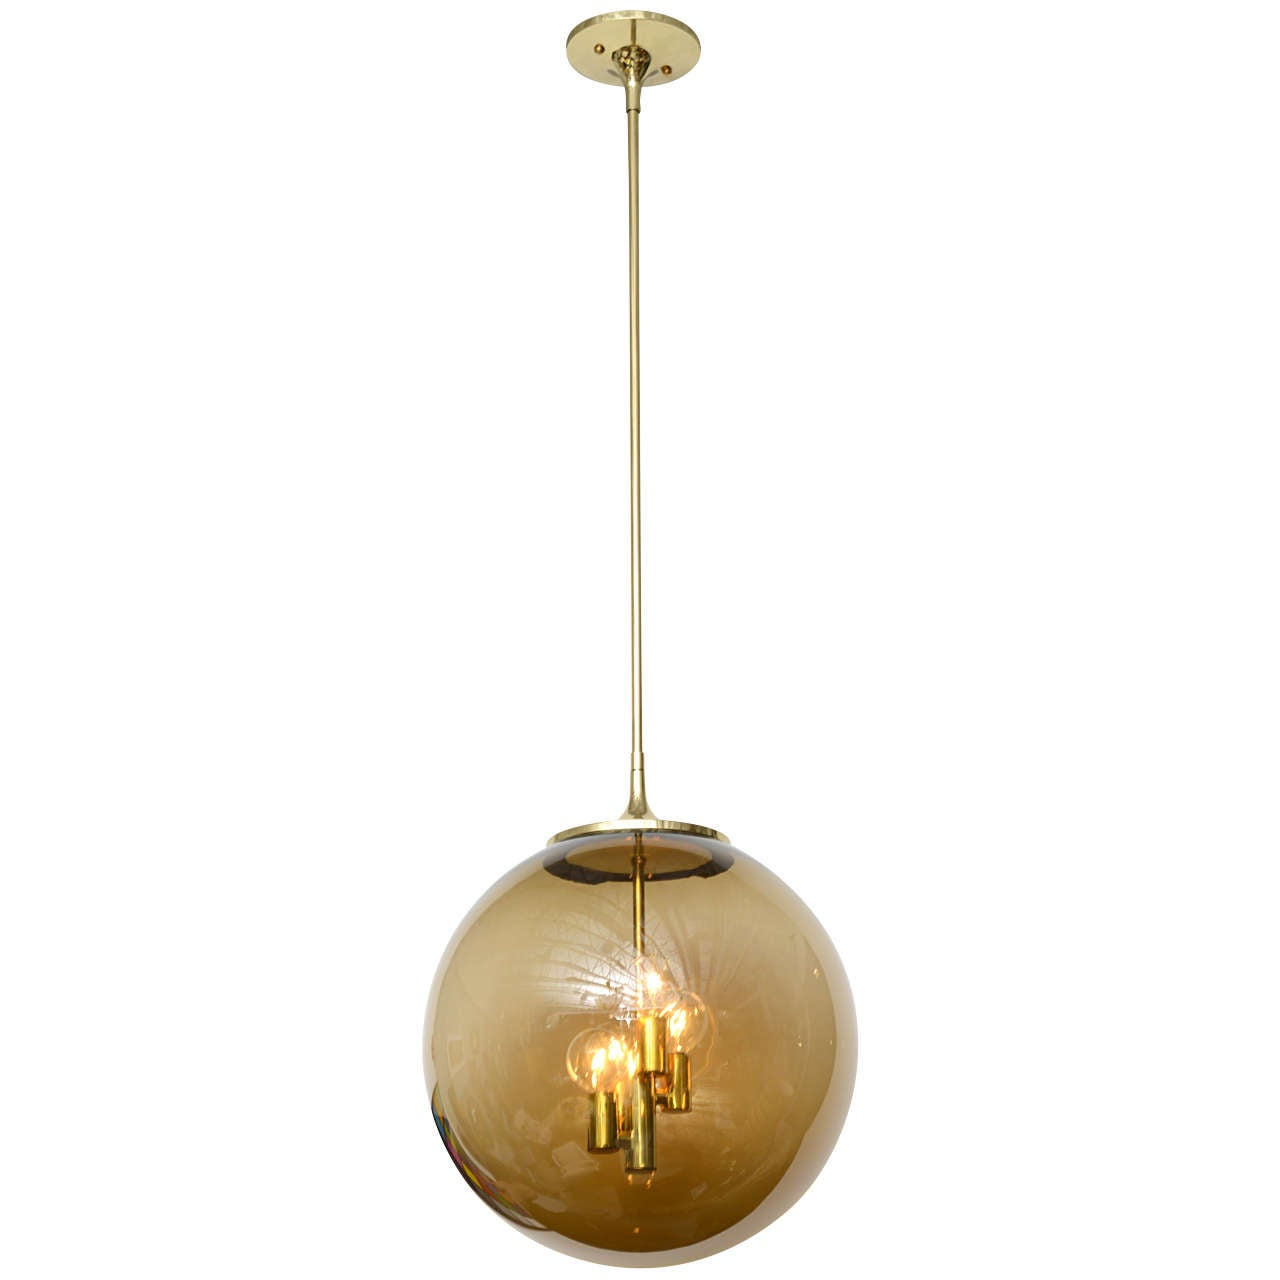 60 s brass globe pendant light at 1stdibs